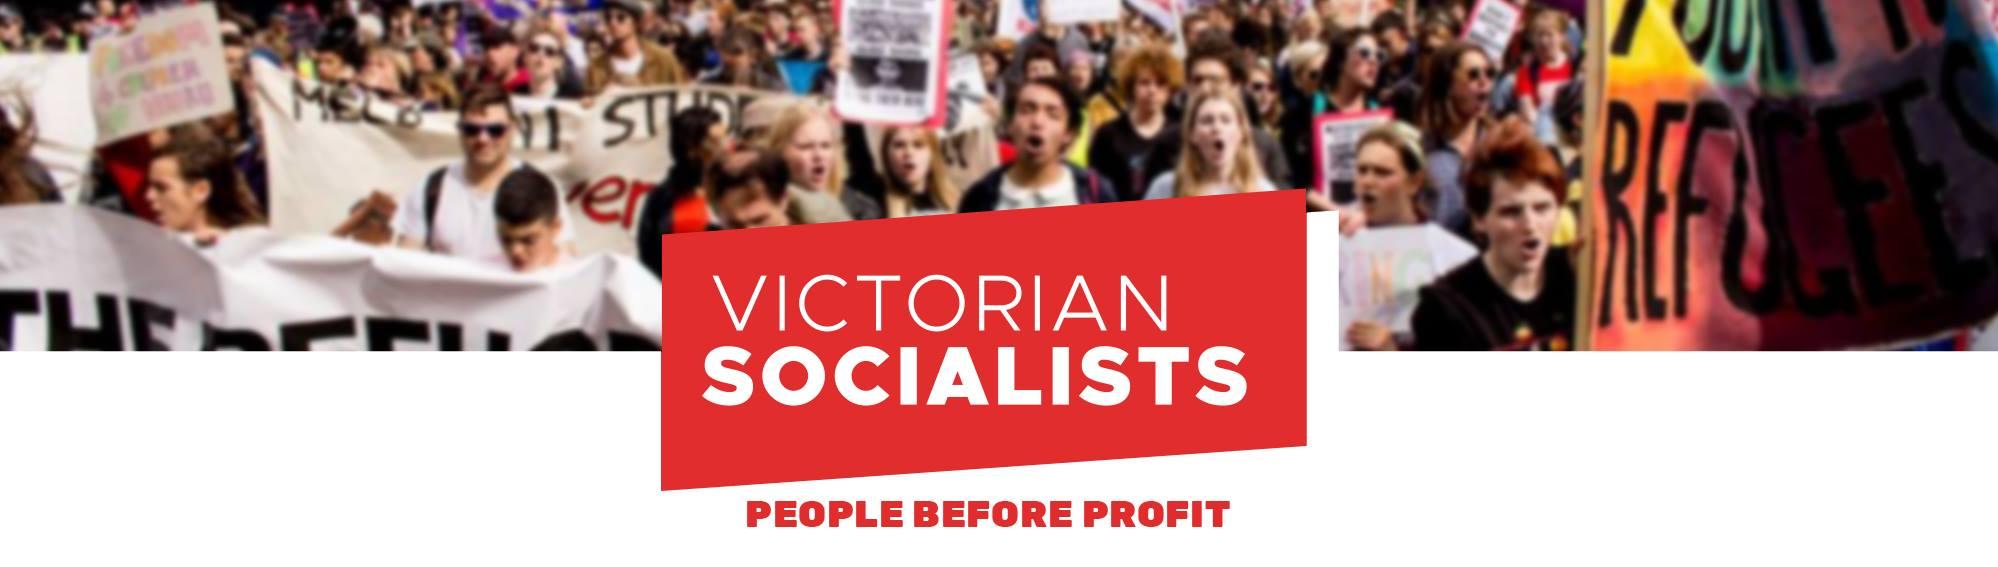 Victorian Socialists